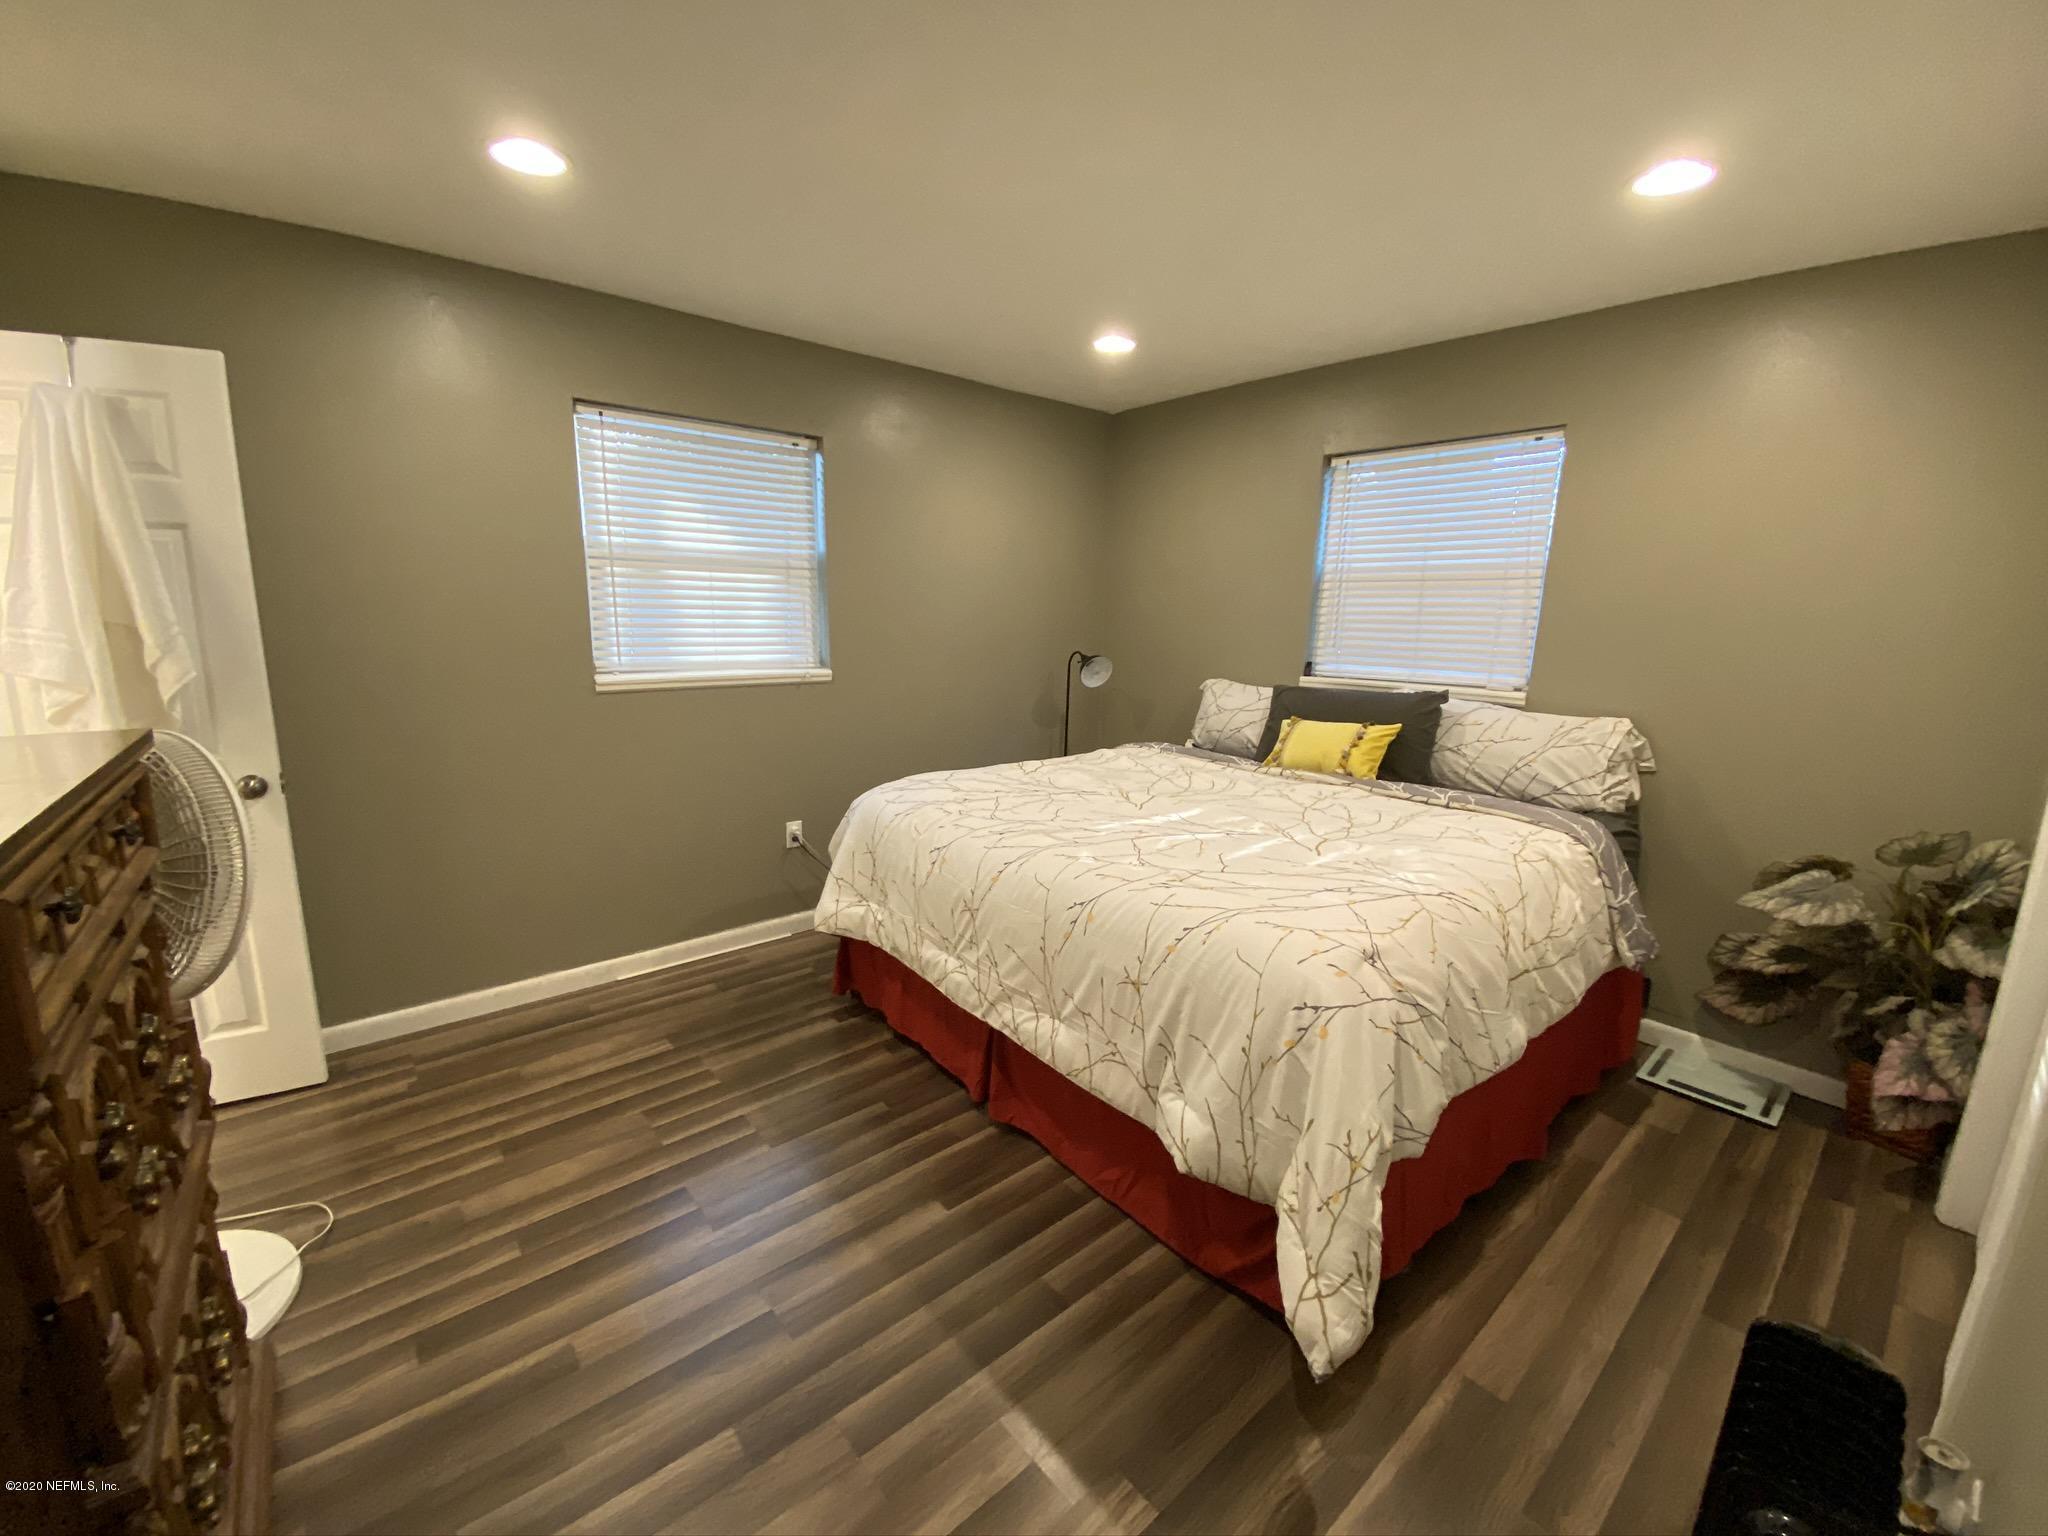 472 GOLF CLUB, LAKE CITY, FLORIDA 32025, 3 Bedrooms Bedrooms, ,2 BathroomsBathrooms,Residential,For sale,GOLF CLUB,1041513